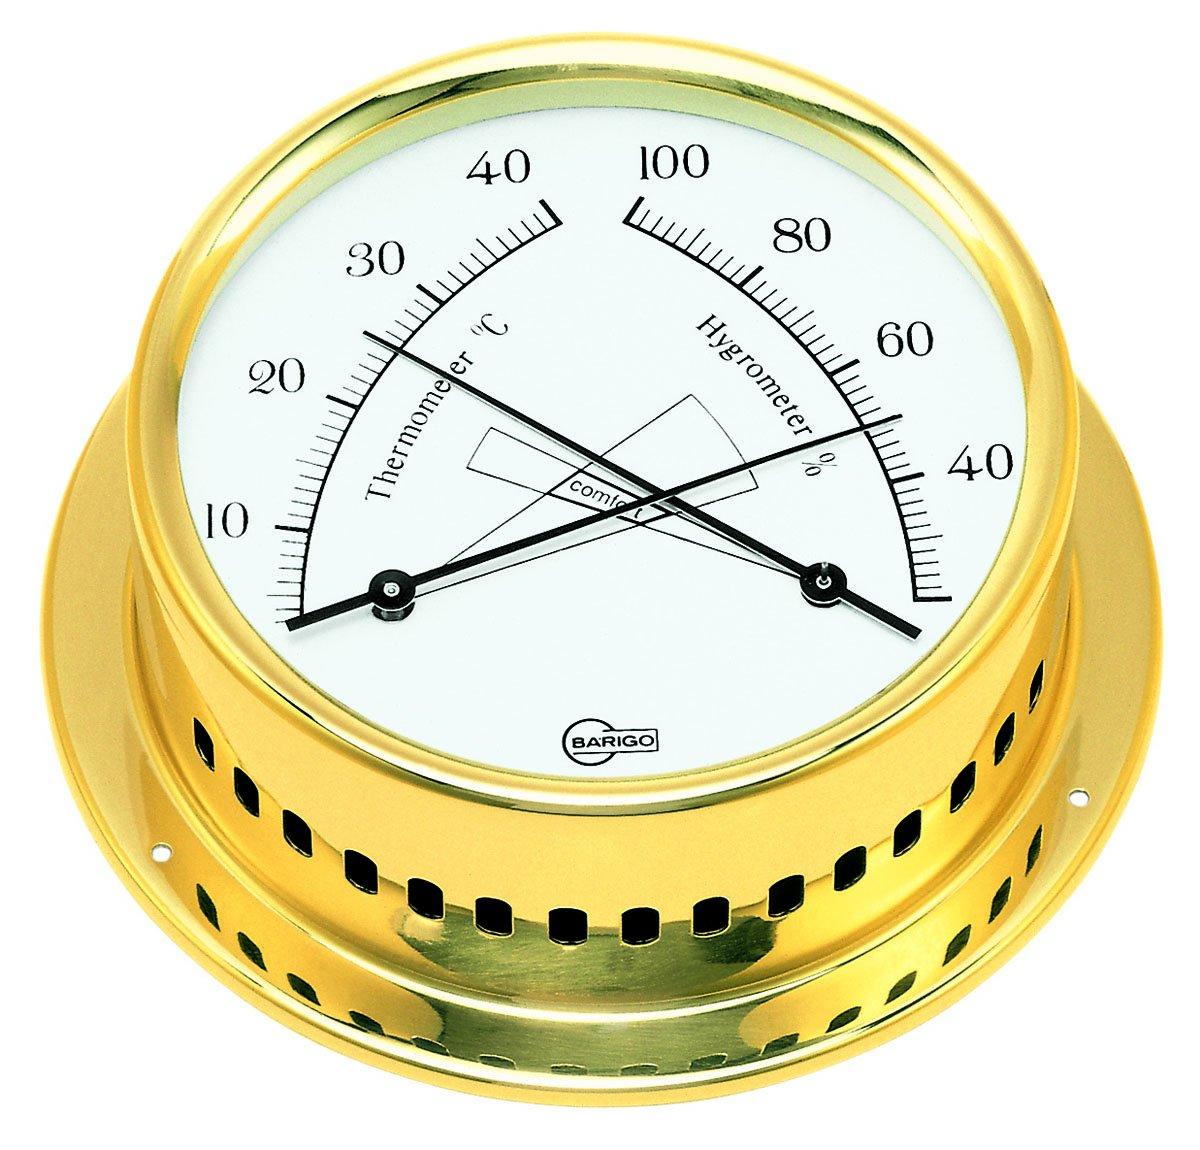 Barigo Termometro/Igrometro Regatta Ottone BARIGO Barometerfabrik GmbH 984MS